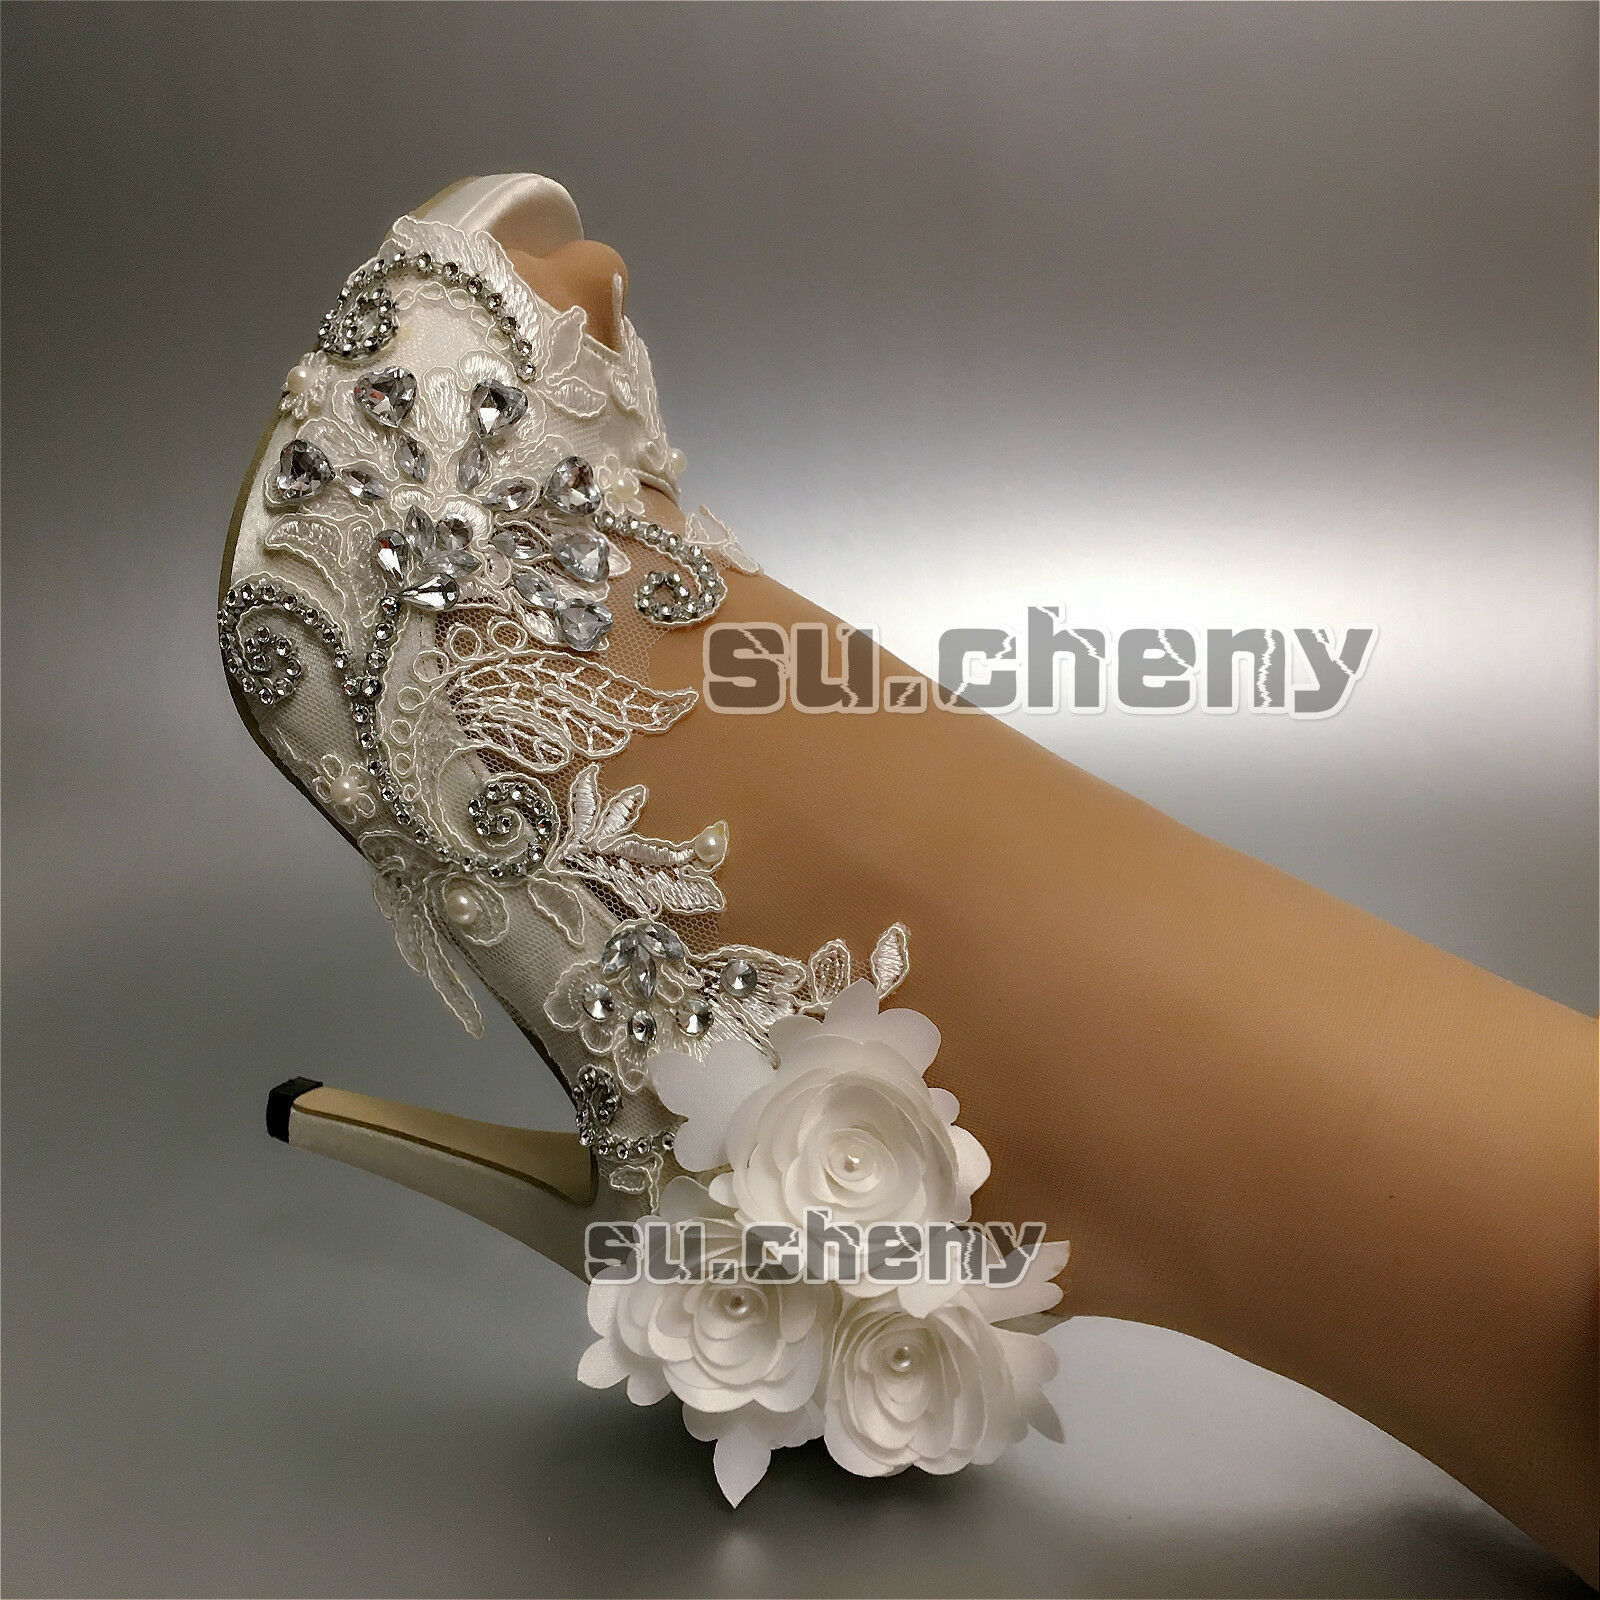 Su.cheny Heels satin Weiß ivory rhinestones peep toe lace Wedding Bridal schuhe